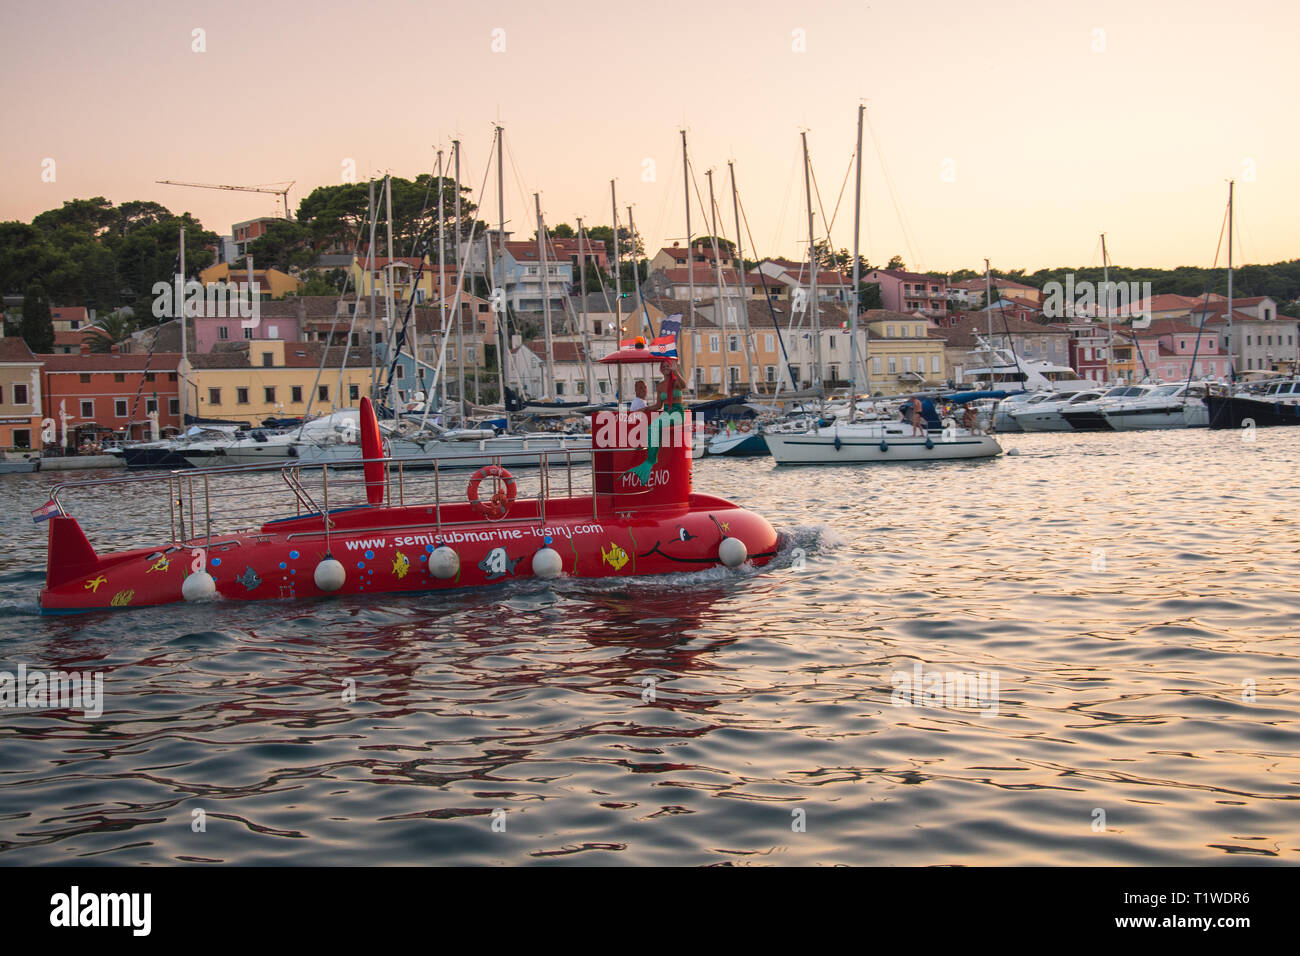 Semi-submarine leaving marina - Stock Image